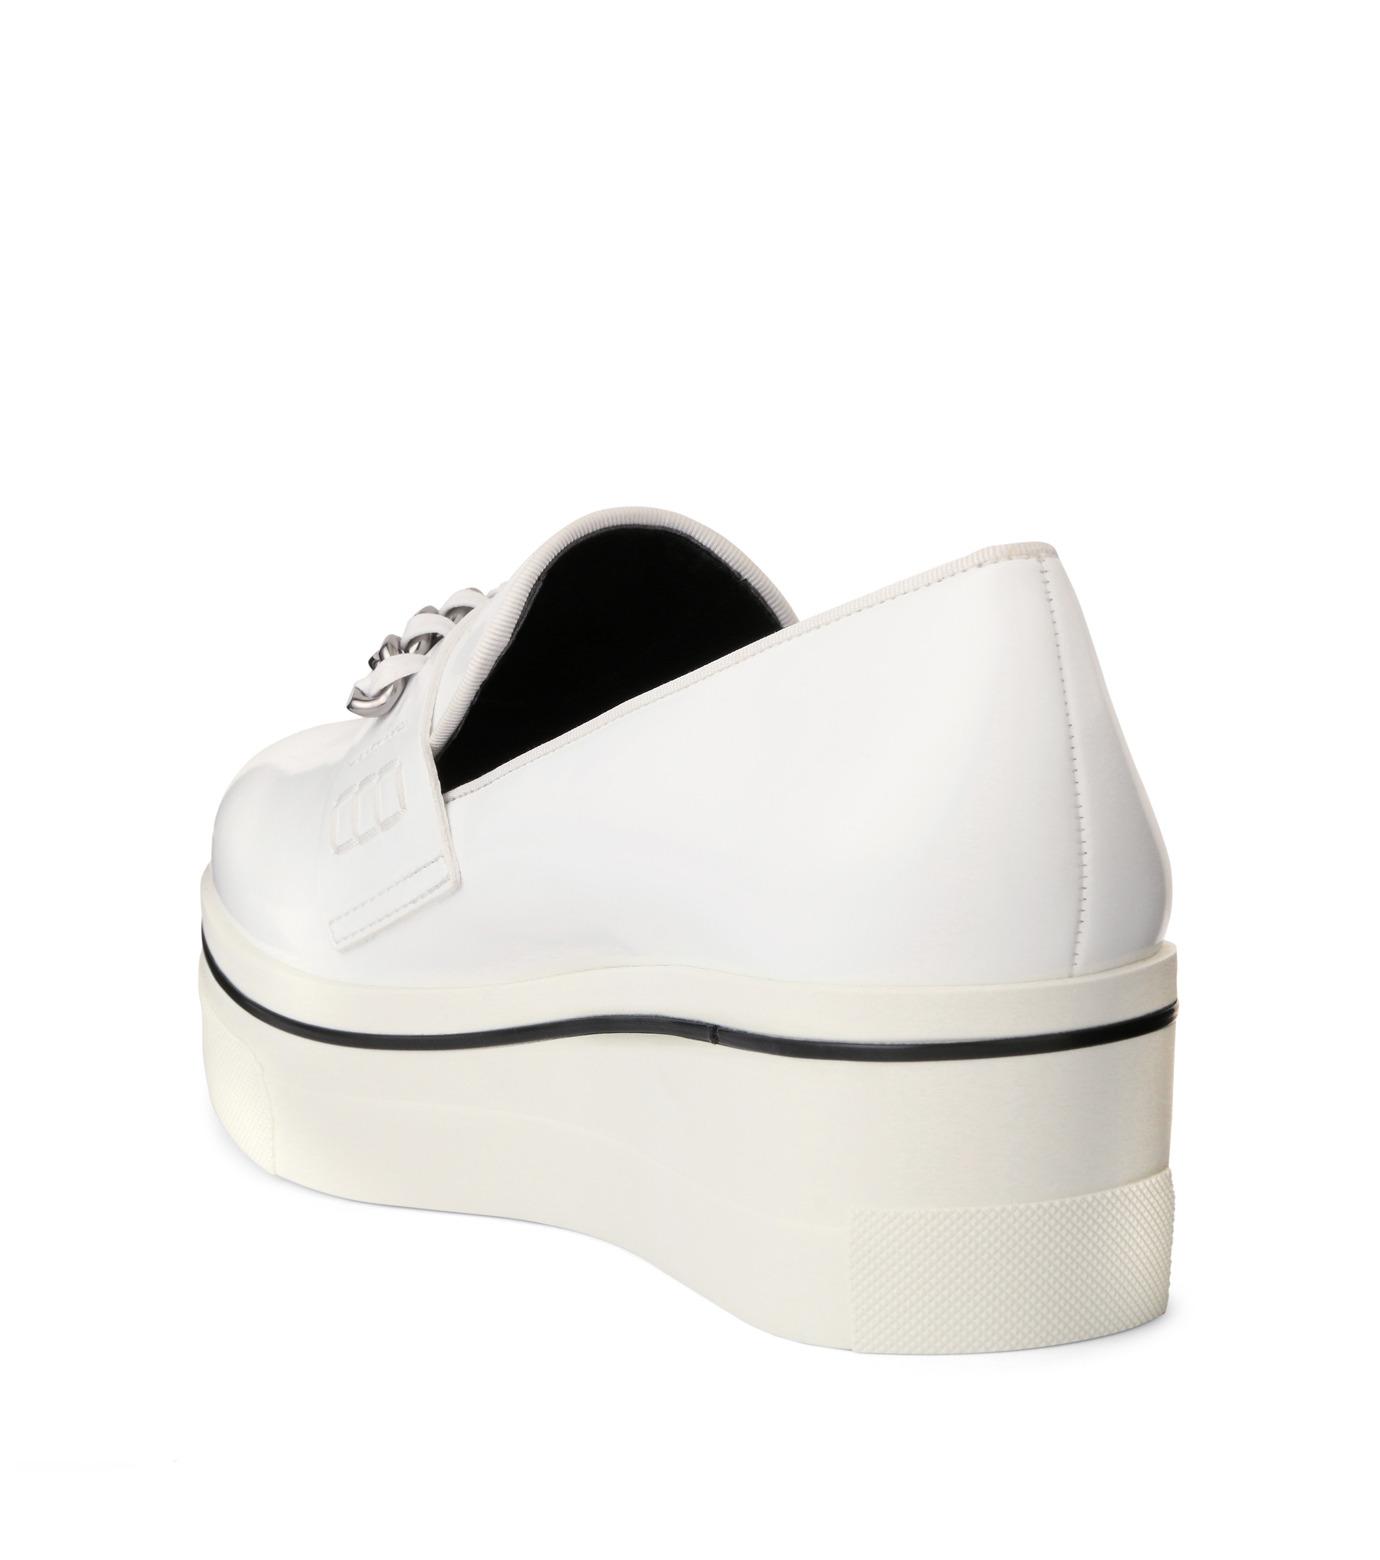 Stella McCartney(ステラマッカートニー)のBinx Sneaker-WHITE(スニーカー/sneaker)-392315-W0VE2-4 拡大詳細画像2